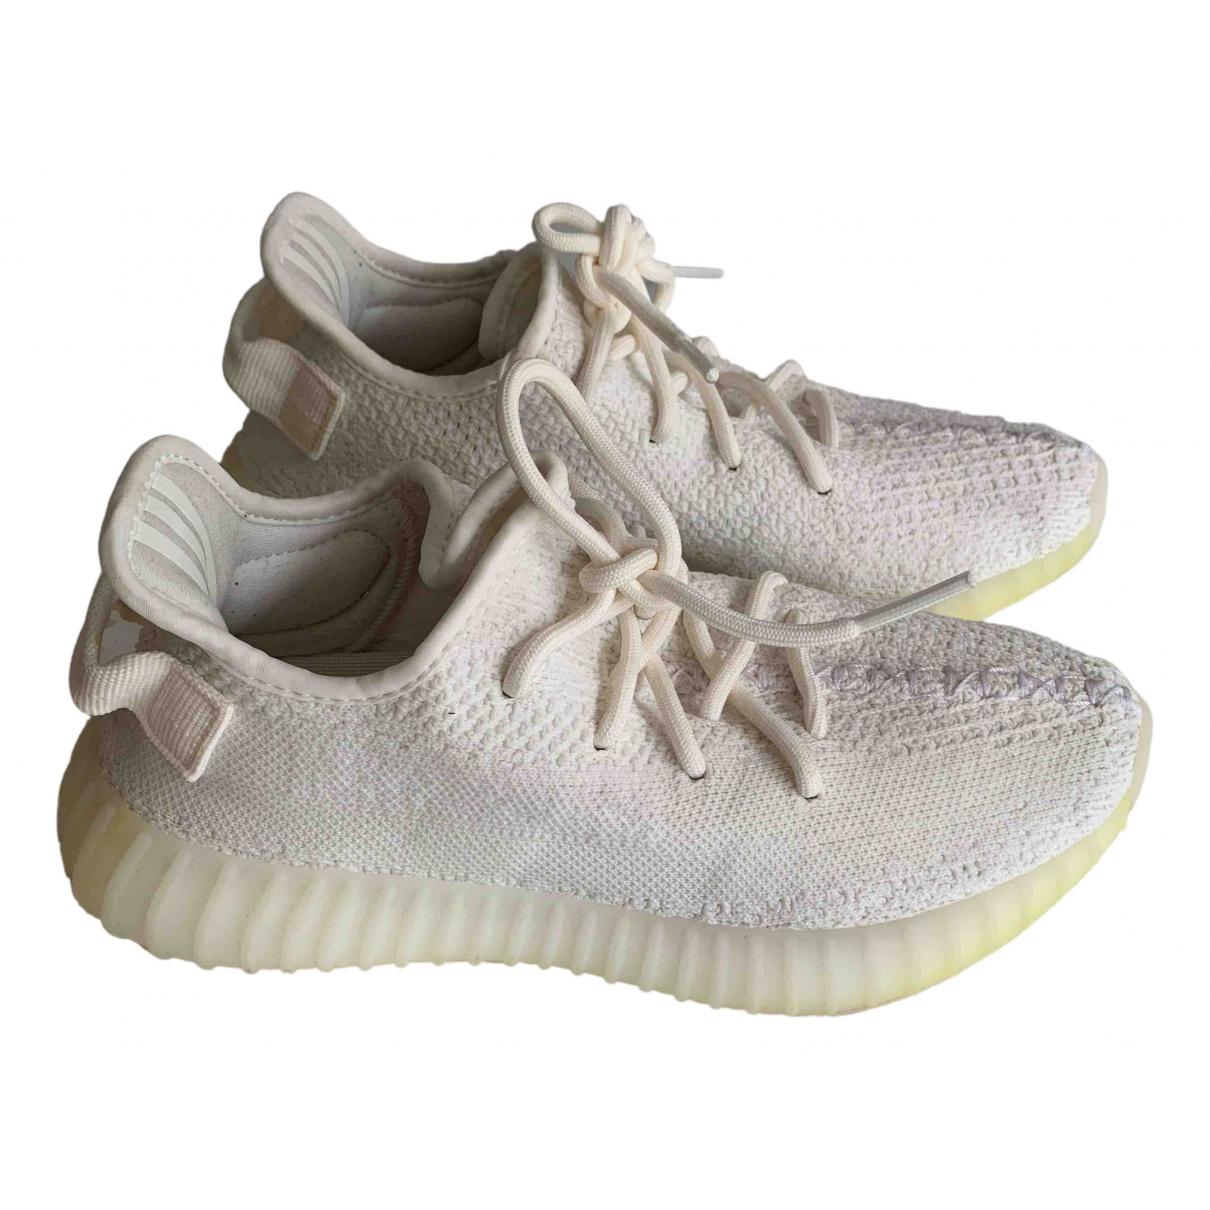 Yeezy X Adidas - Baskets Boost 350 V2 pour femme en toile - blanc